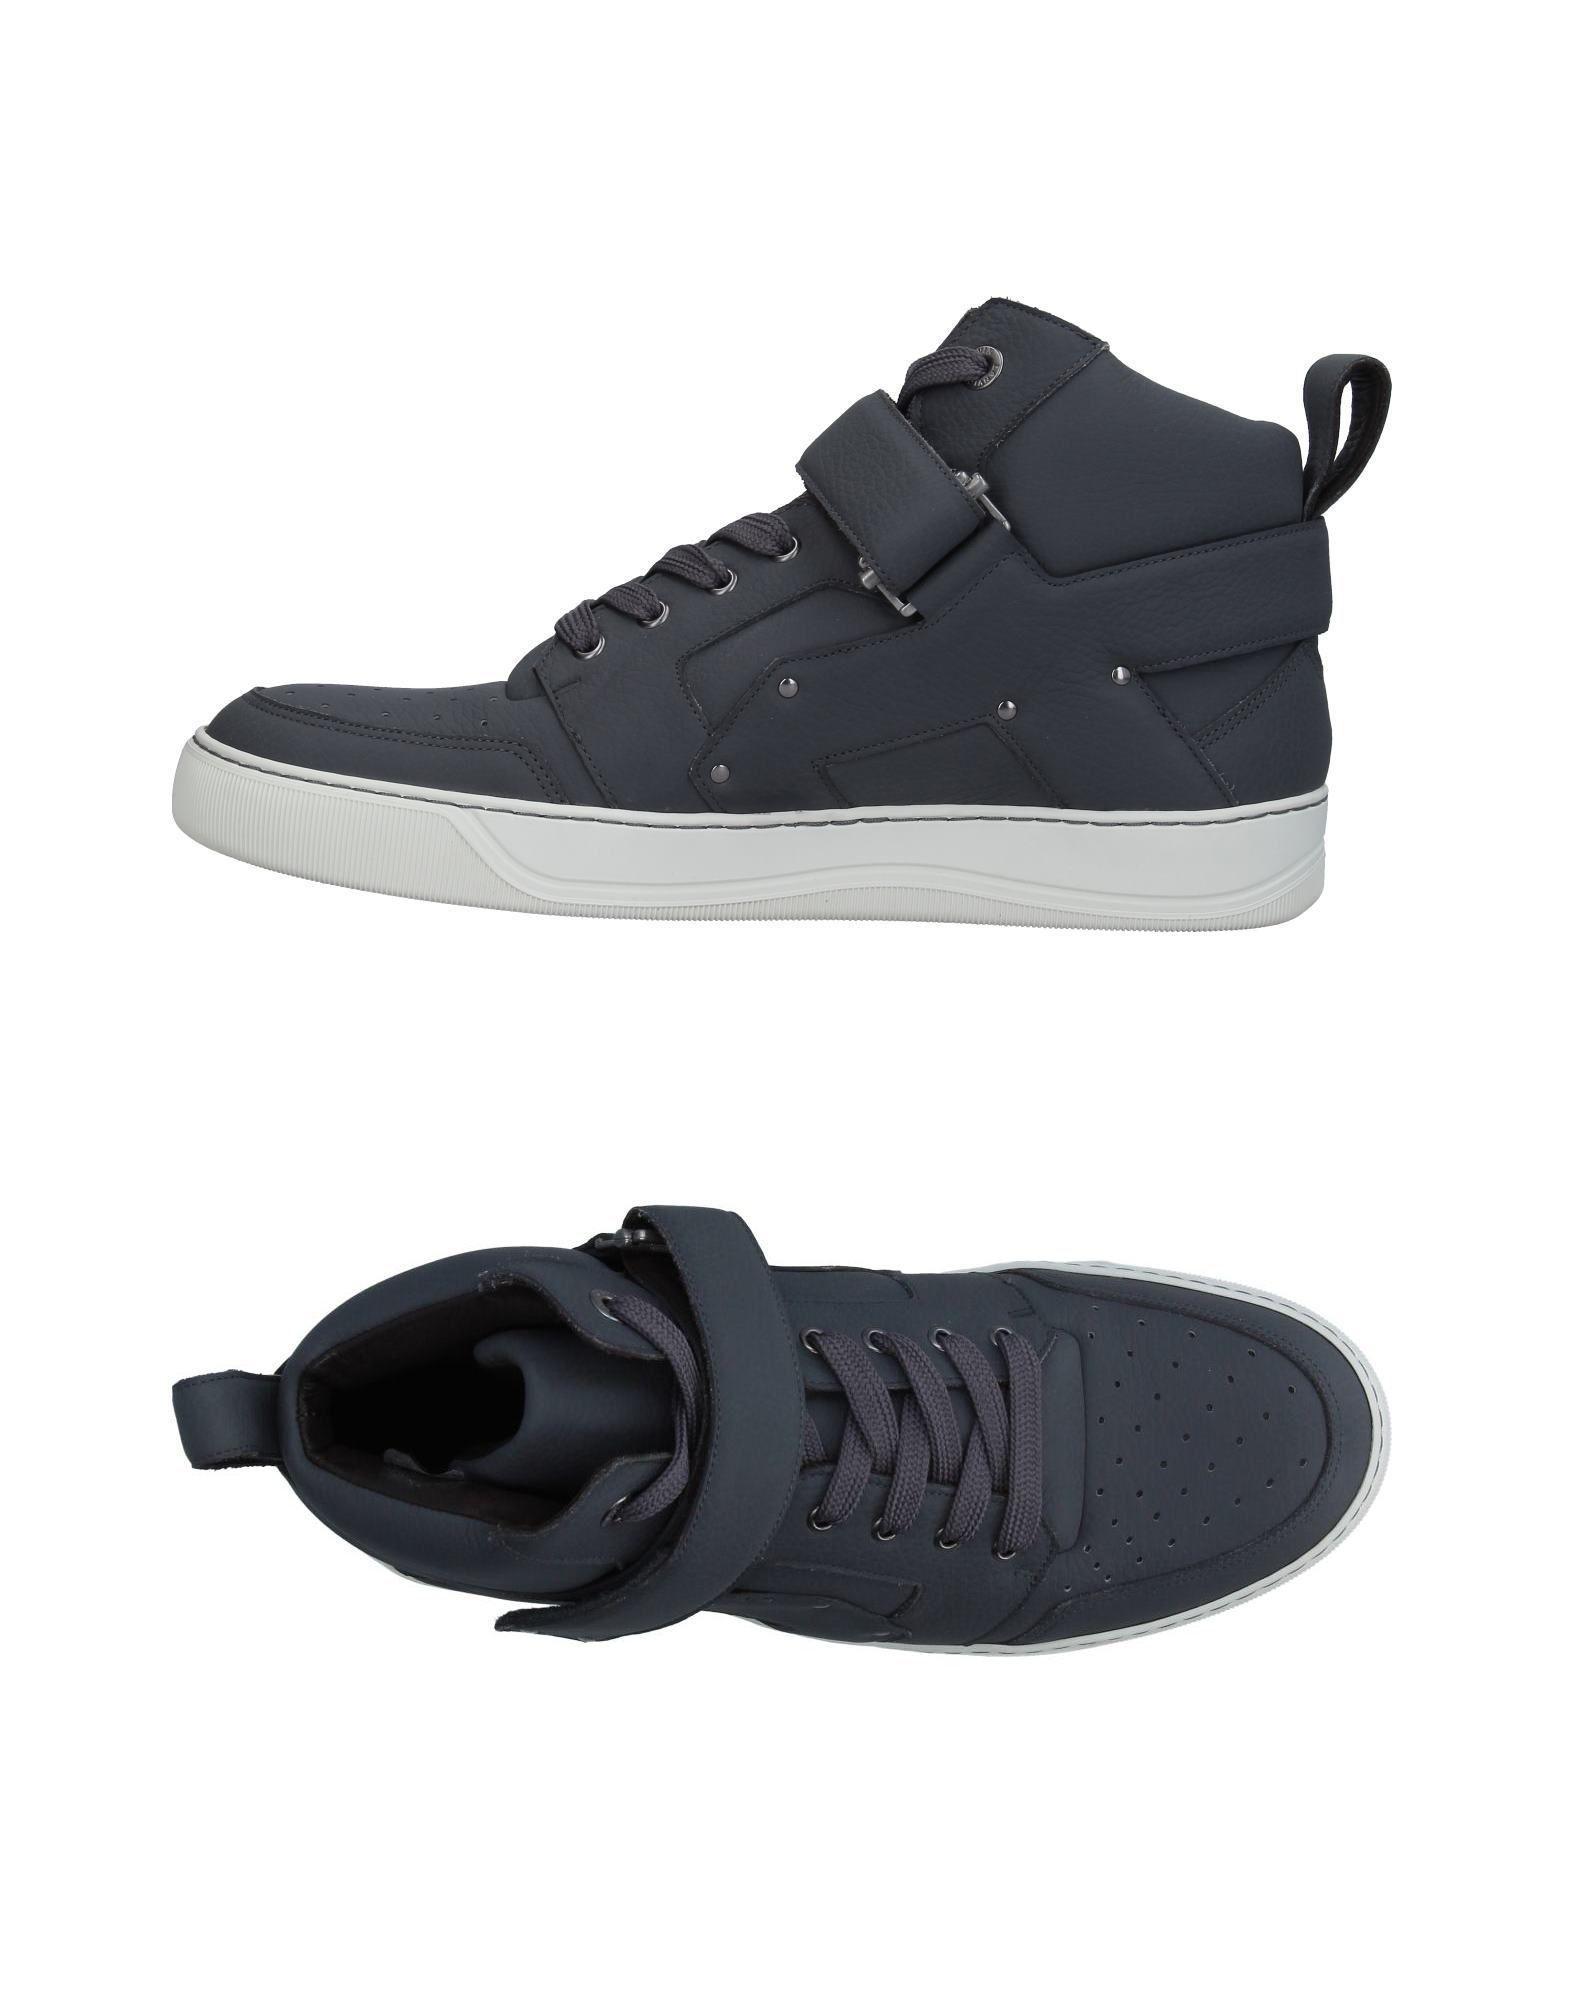 Lanvin Sneakers In Grey